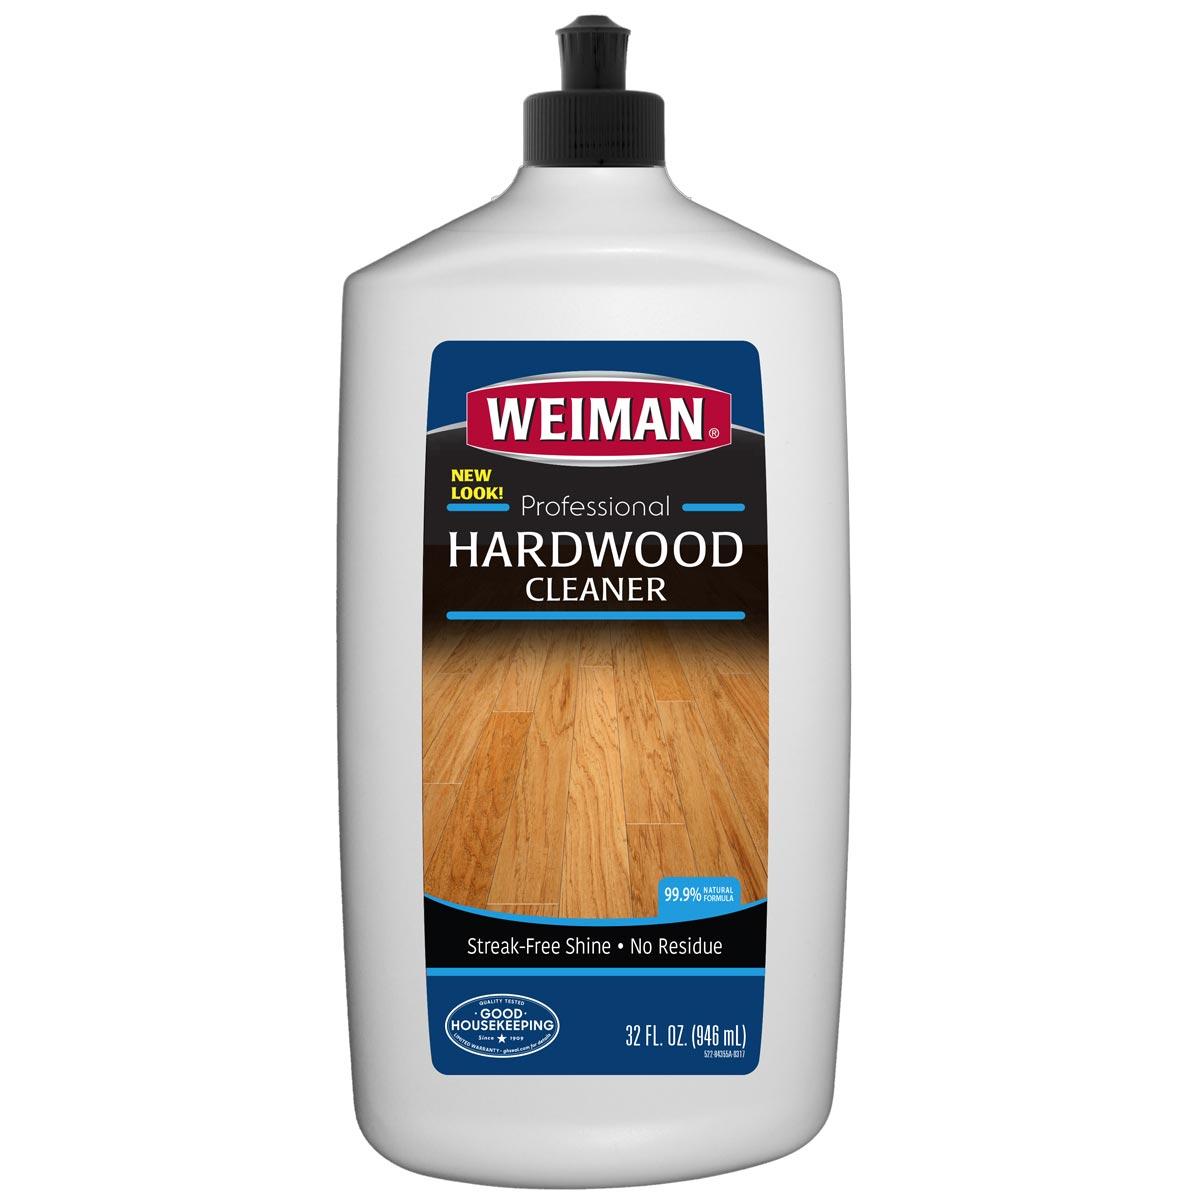 Hardwood Cleaner